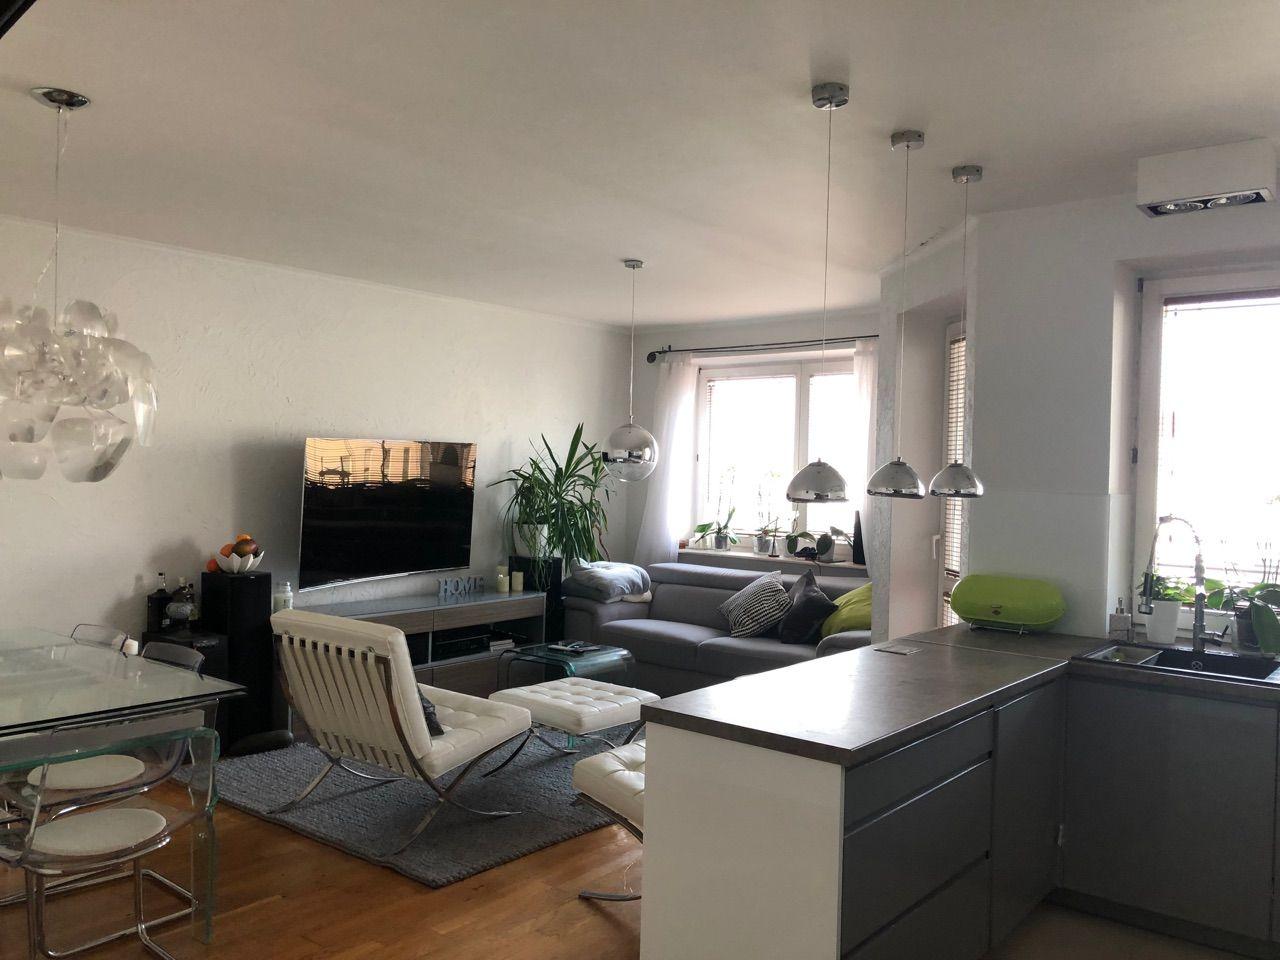 Квартира в Люблине 106 м2